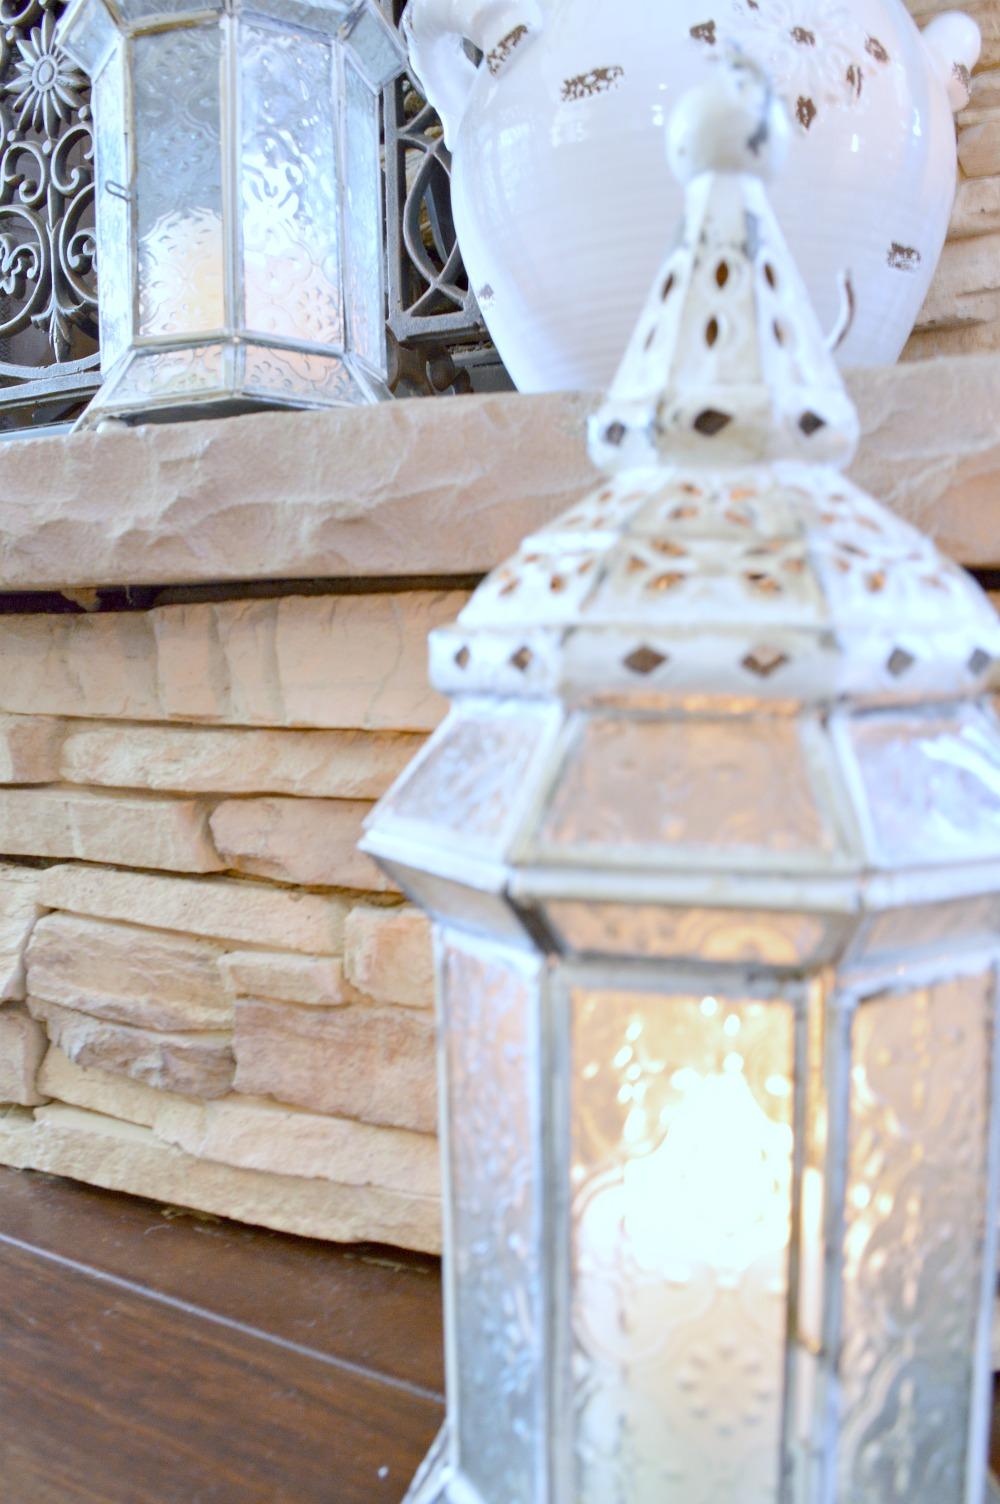 Don't throw away an old lantern, paint it!